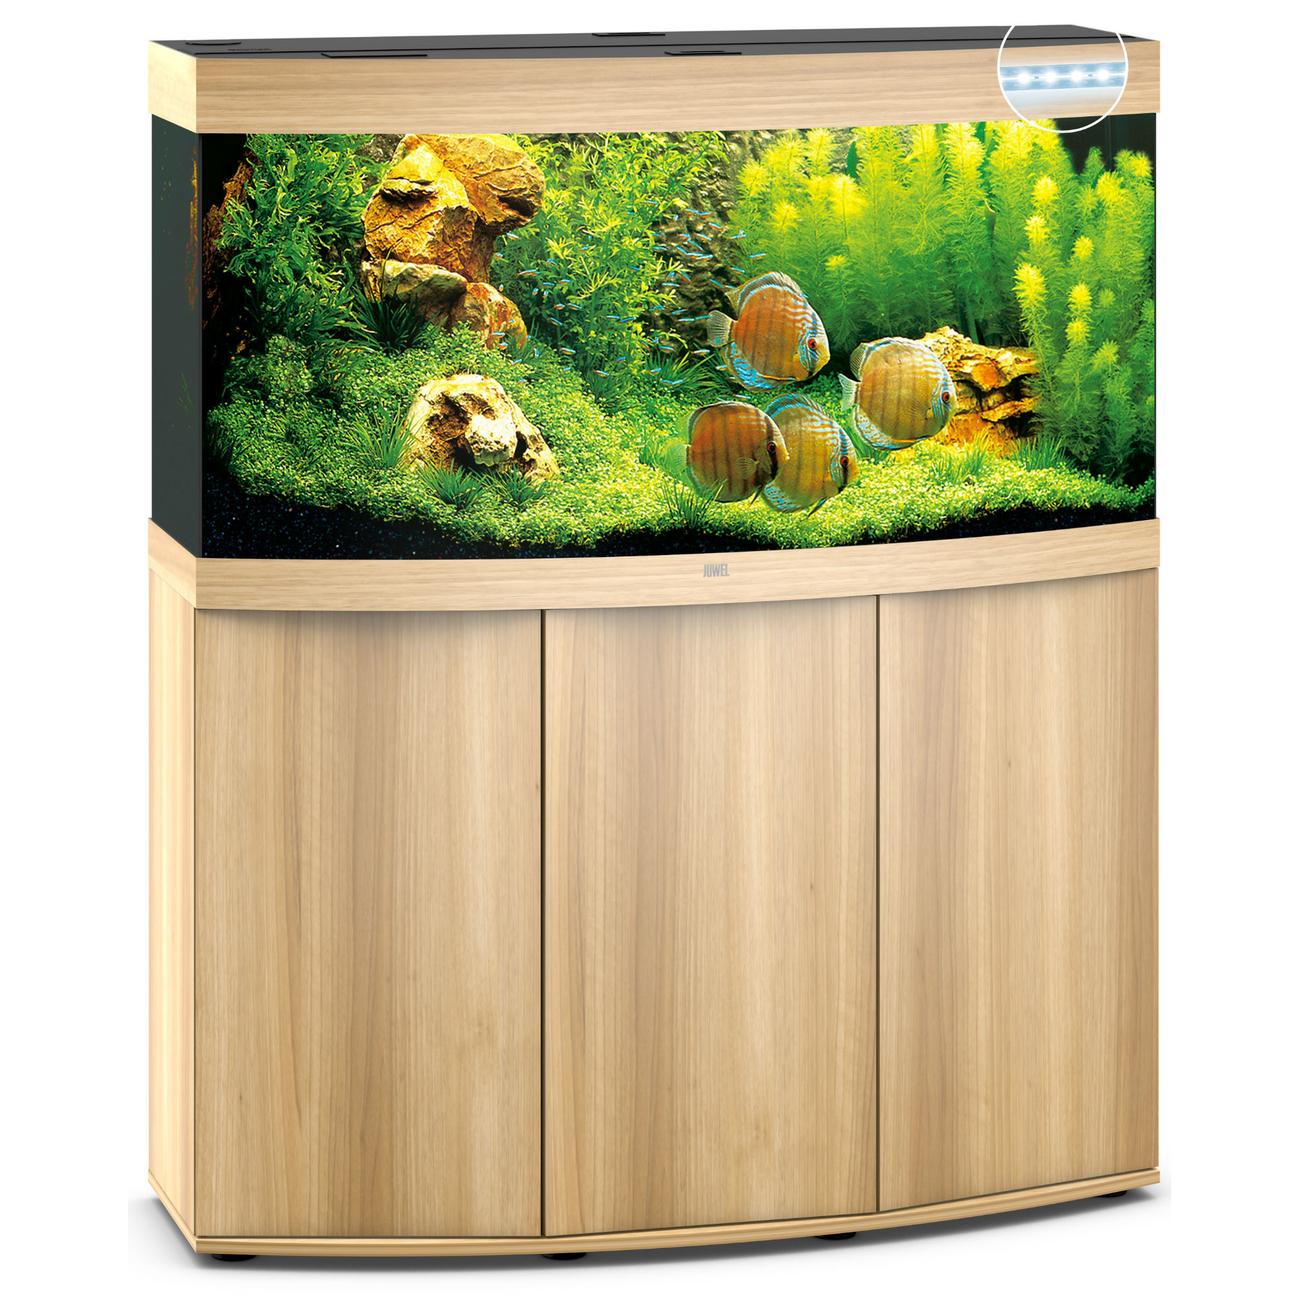 Juwel Vision 260 LED Aquarium mit Unterschrank SBX, Bild 16